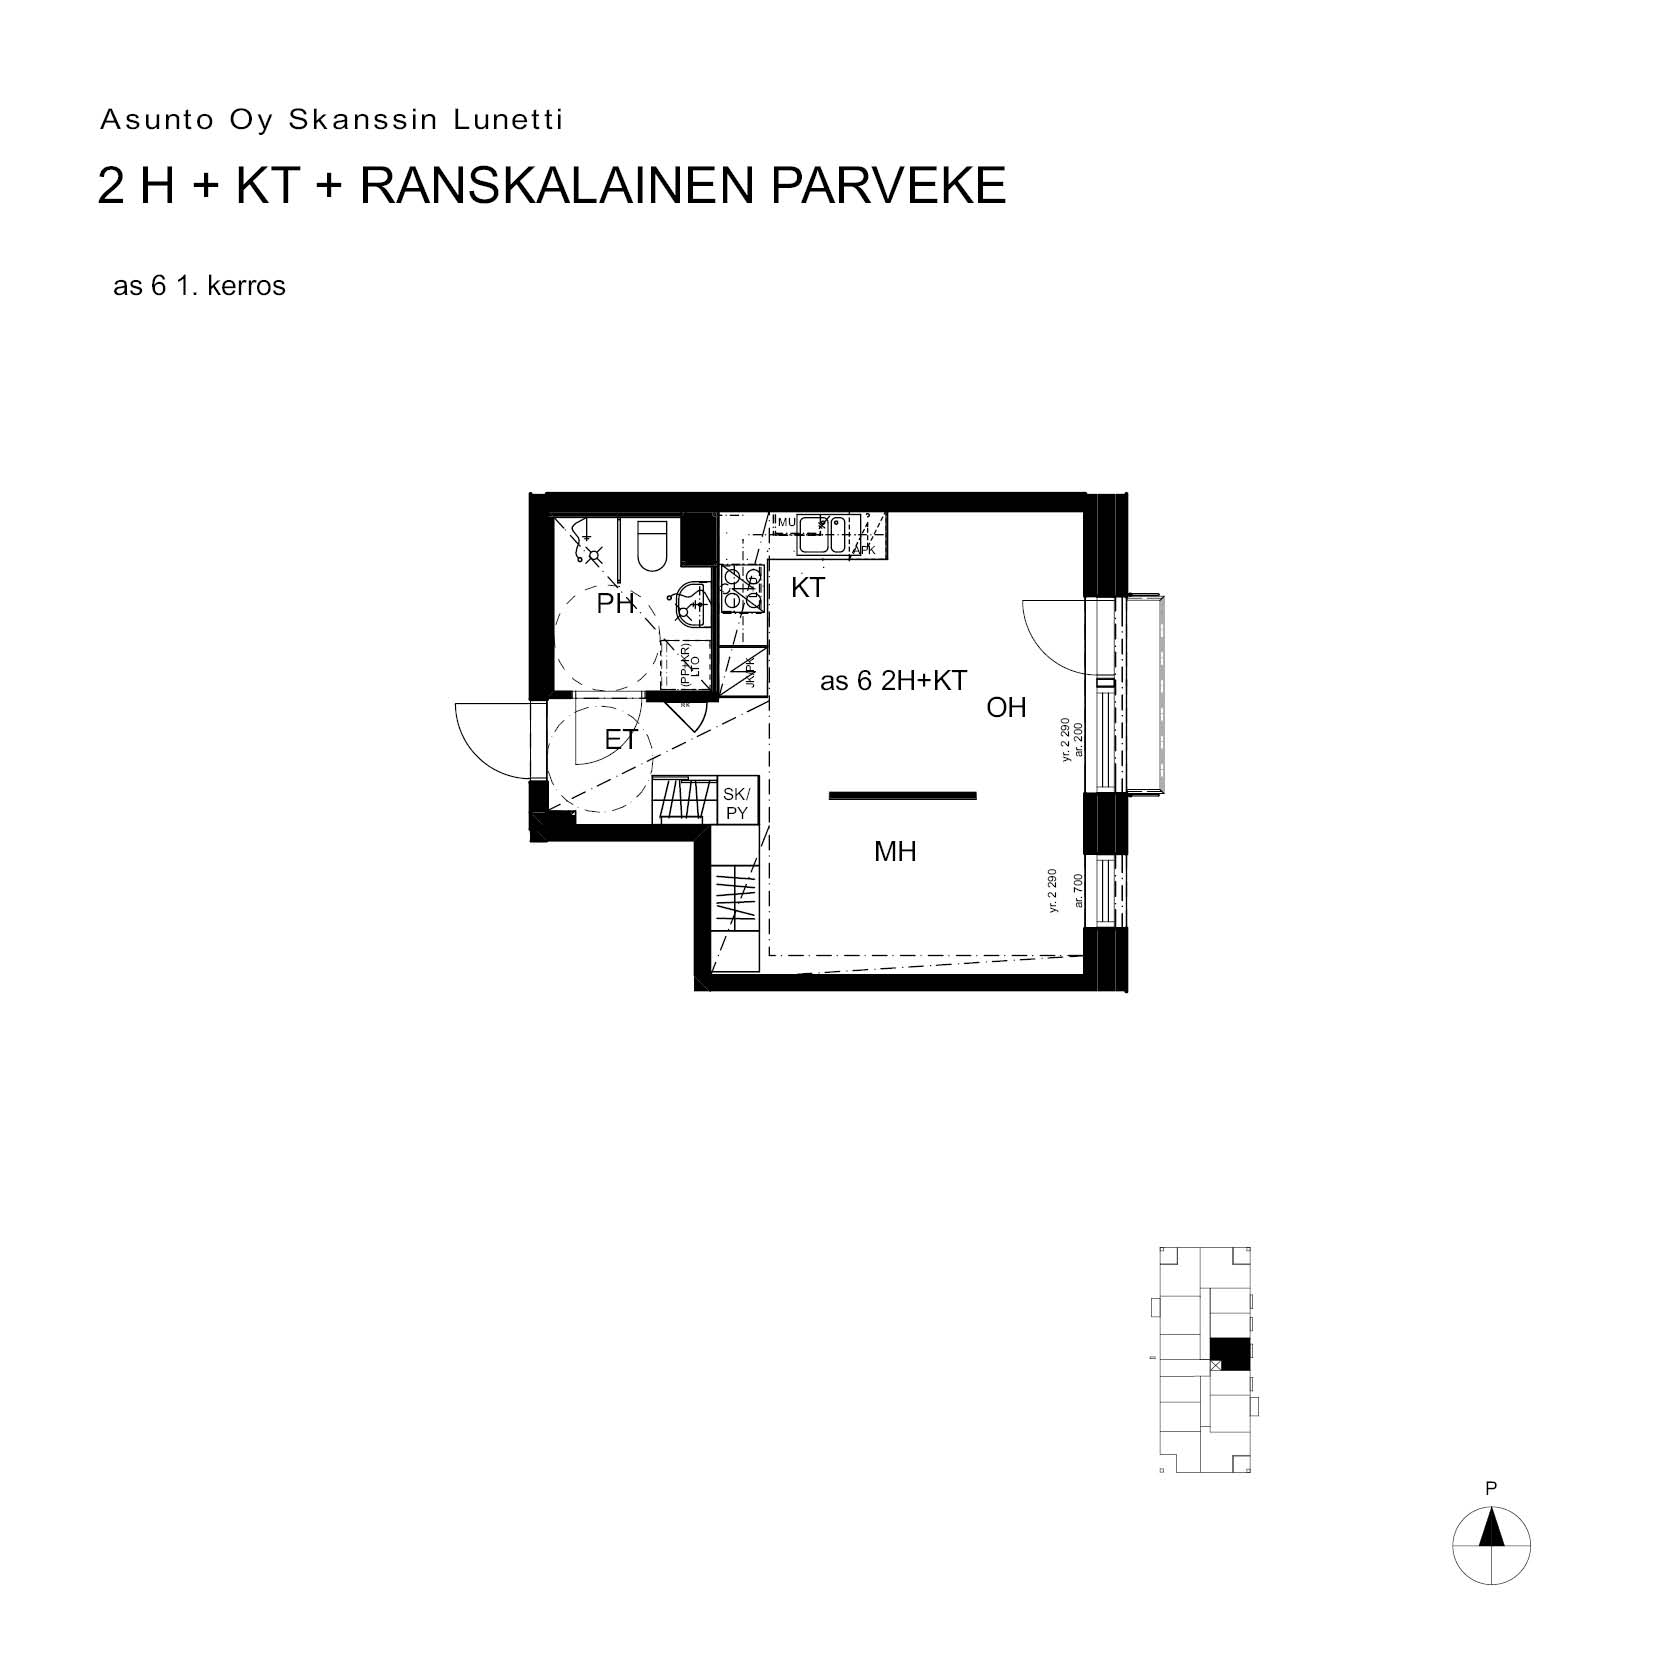 Asunto Oy Turun Skanssin Lunetti - Skanssinkatu 36, 20730, Turku - 2H+KT+ransk.p. / 33.5m2